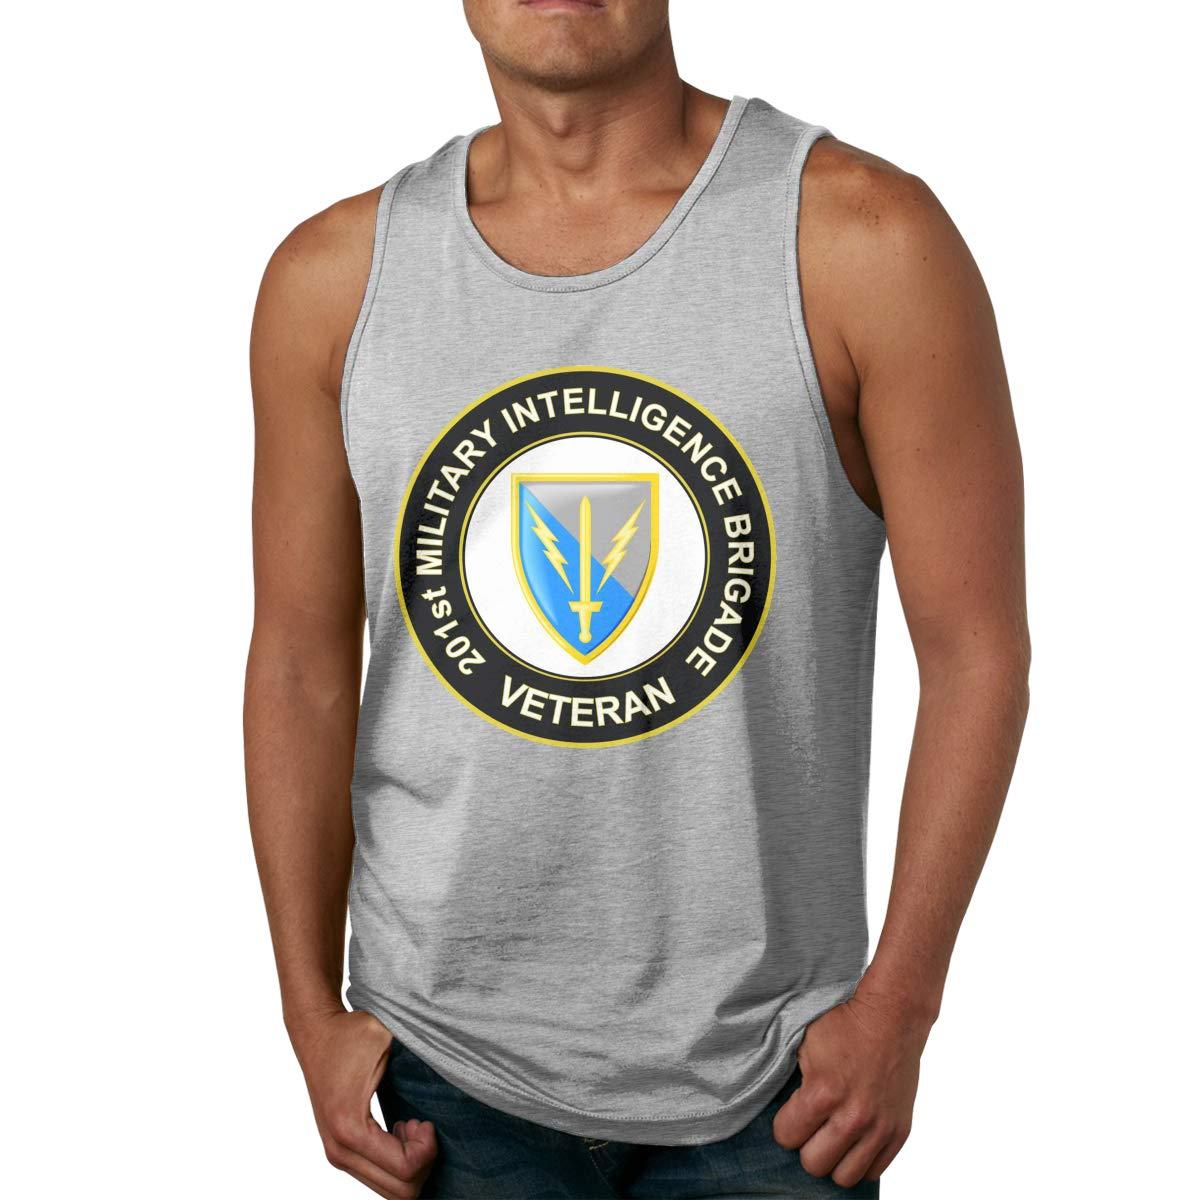 Bohoustore U.S Army 201st Military Intelligence Brigade Veteran Mens Undershirts Tank Tops